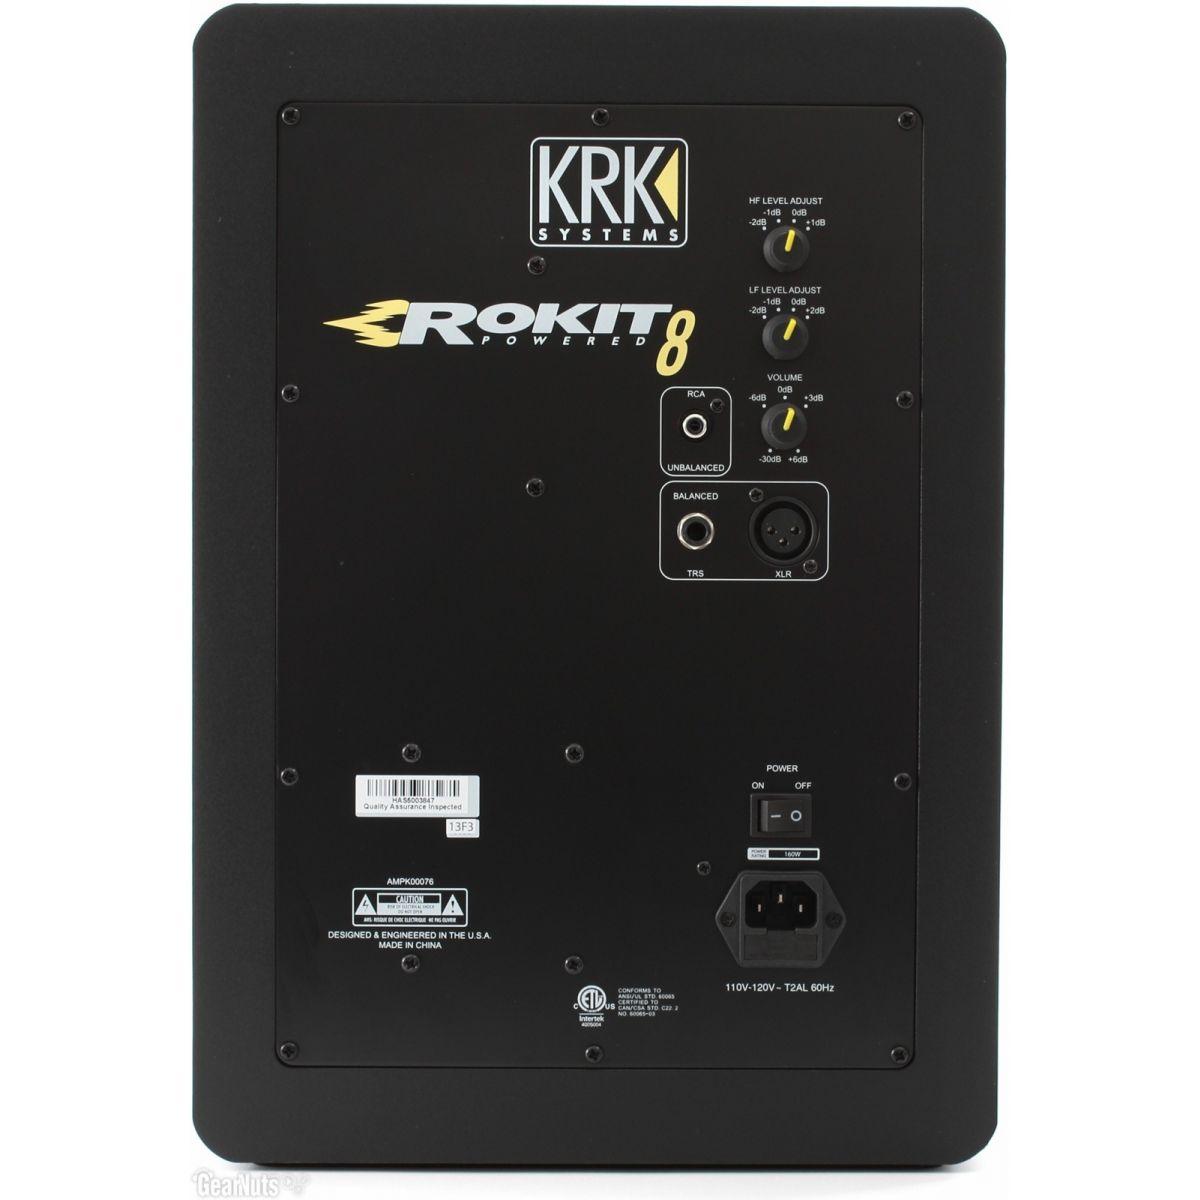 KRK Rokit 8 G3 RP8 Monitor de Áudio, Preto, 220v, Par